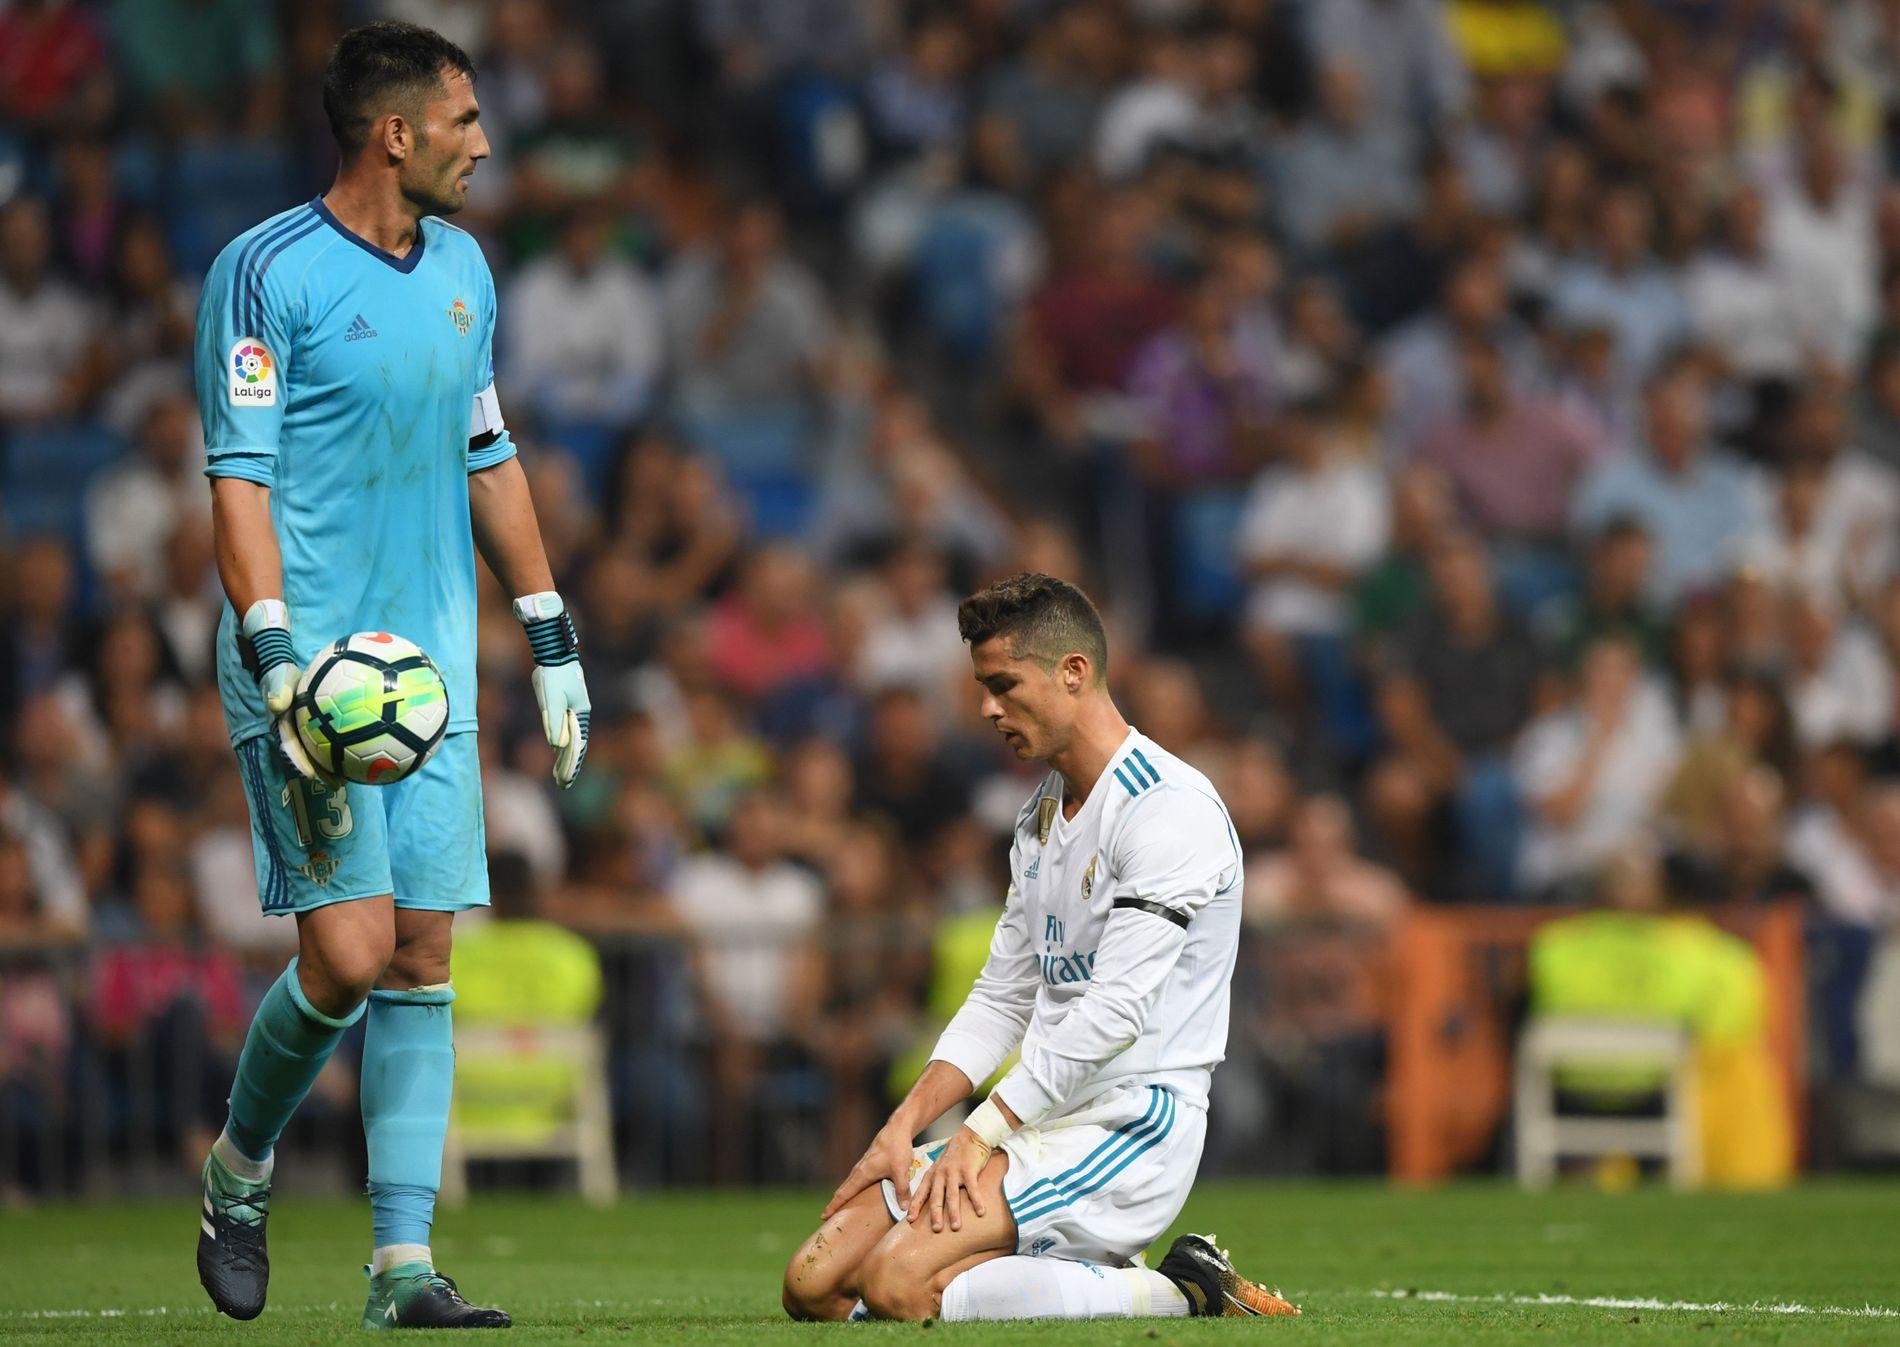 PÅ KNE: Real Madrids Cristiano Ronaldo sitter oppgitt foran Real Betis-keeper Antonio Adan.